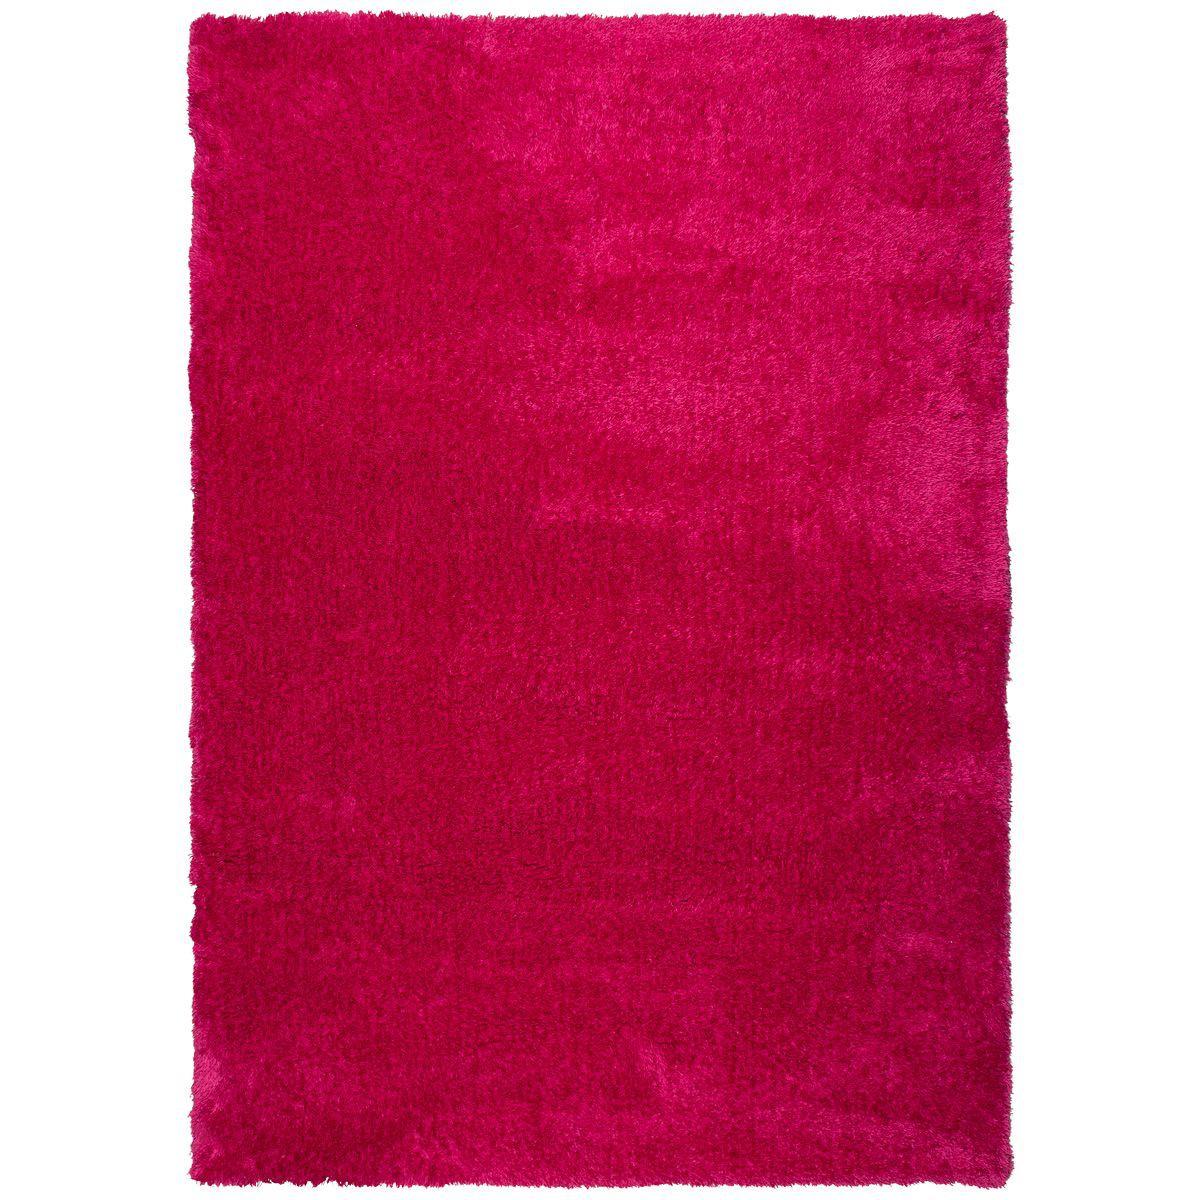 lars contzen teppich colourcourage hochflor raspberry pink. Black Bedroom Furniture Sets. Home Design Ideas